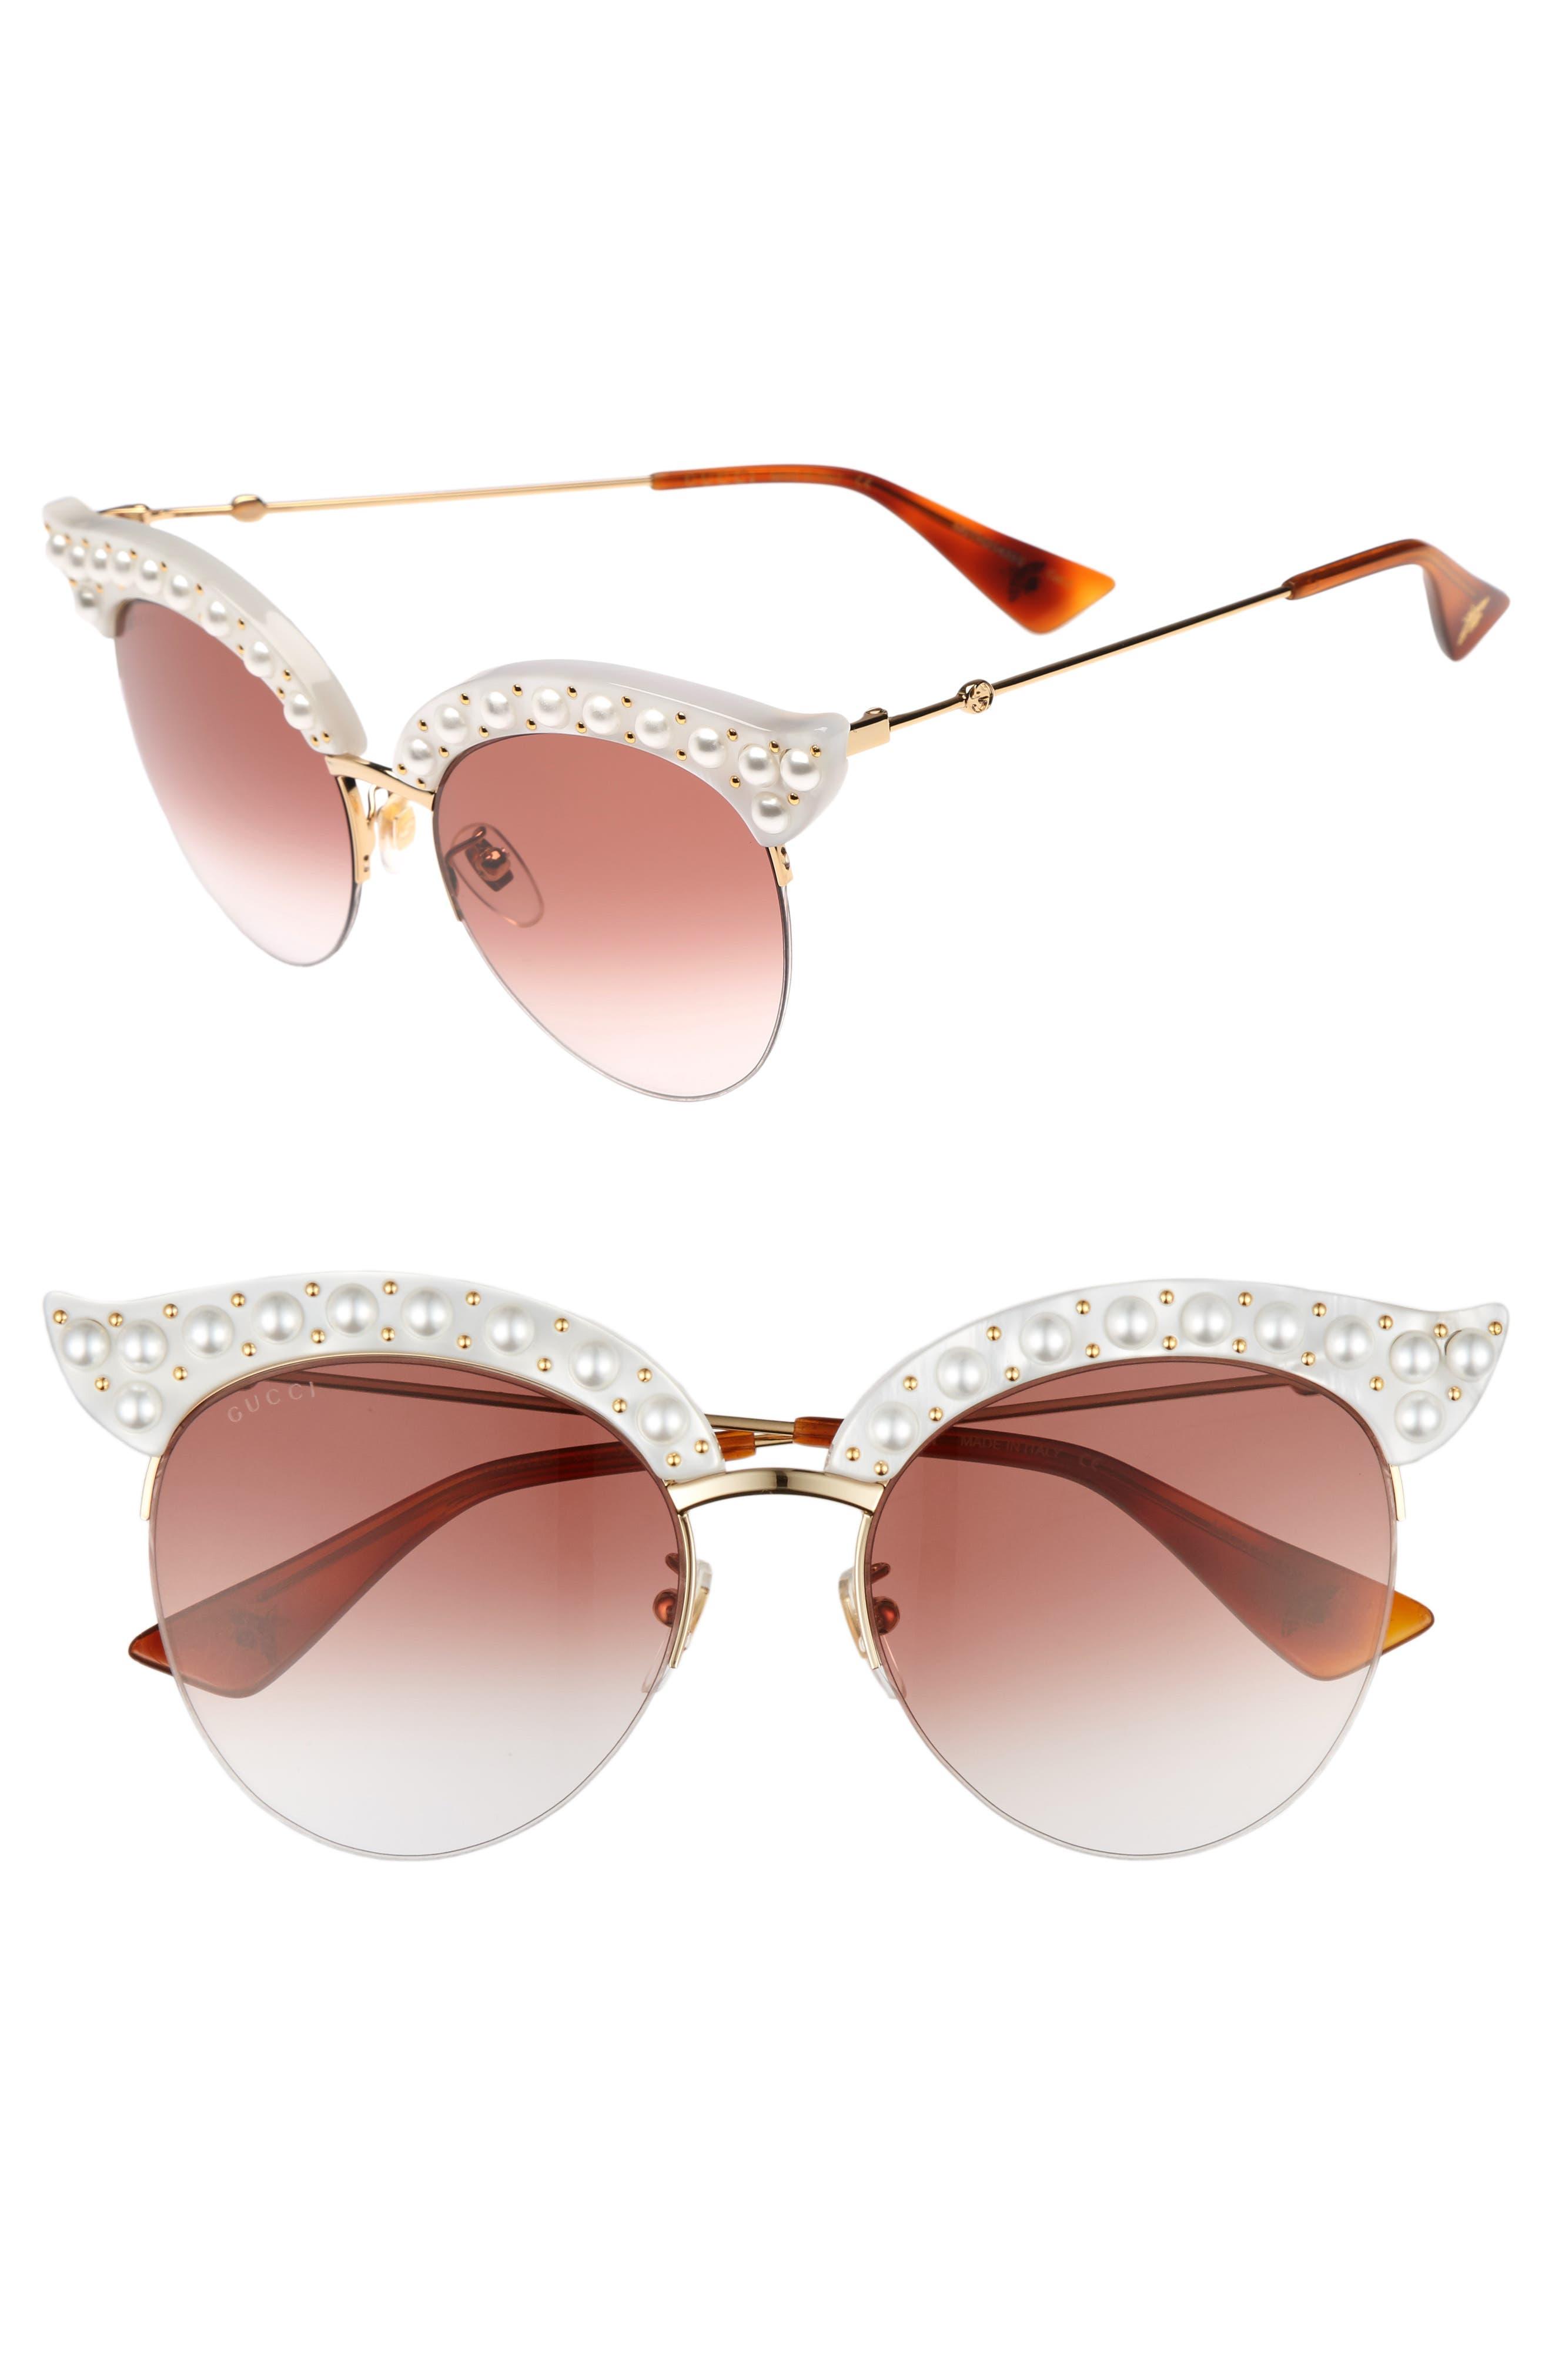 53mm Embellished Cat Eye Sunglasses,                         Main,                         color, White